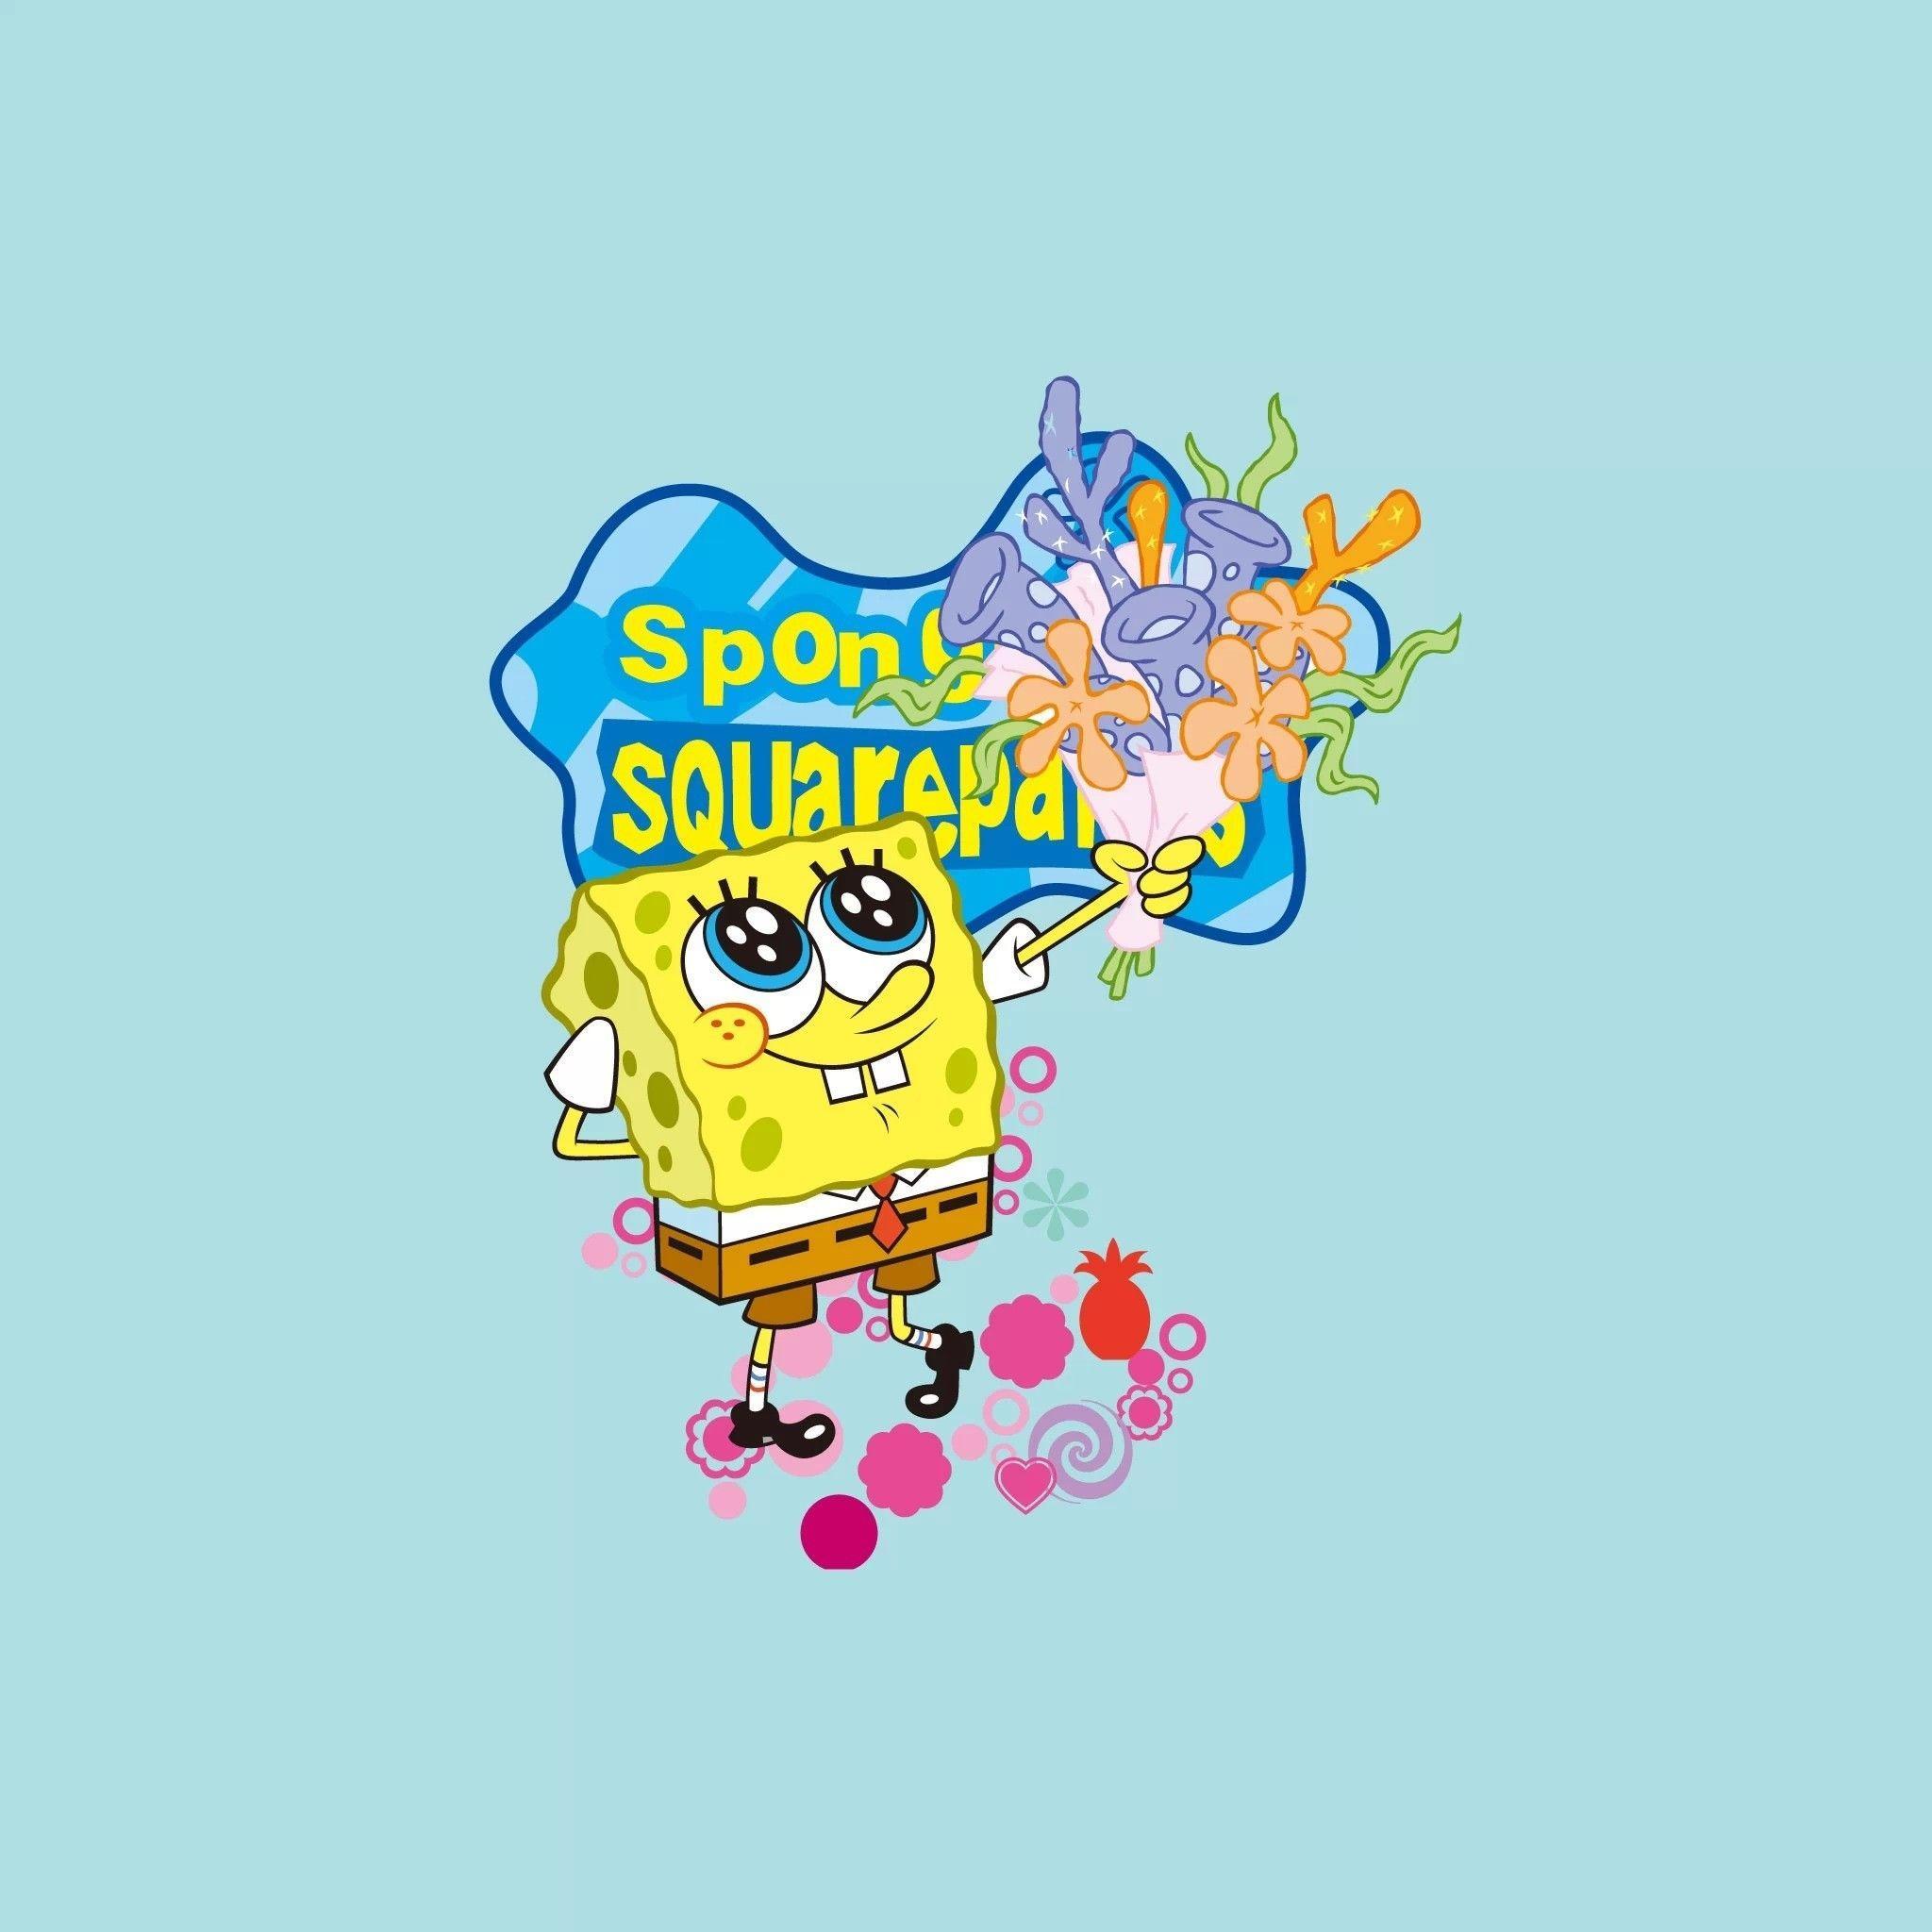 Spongebob Flower Sky Backgrounds - Wallpaper Cave